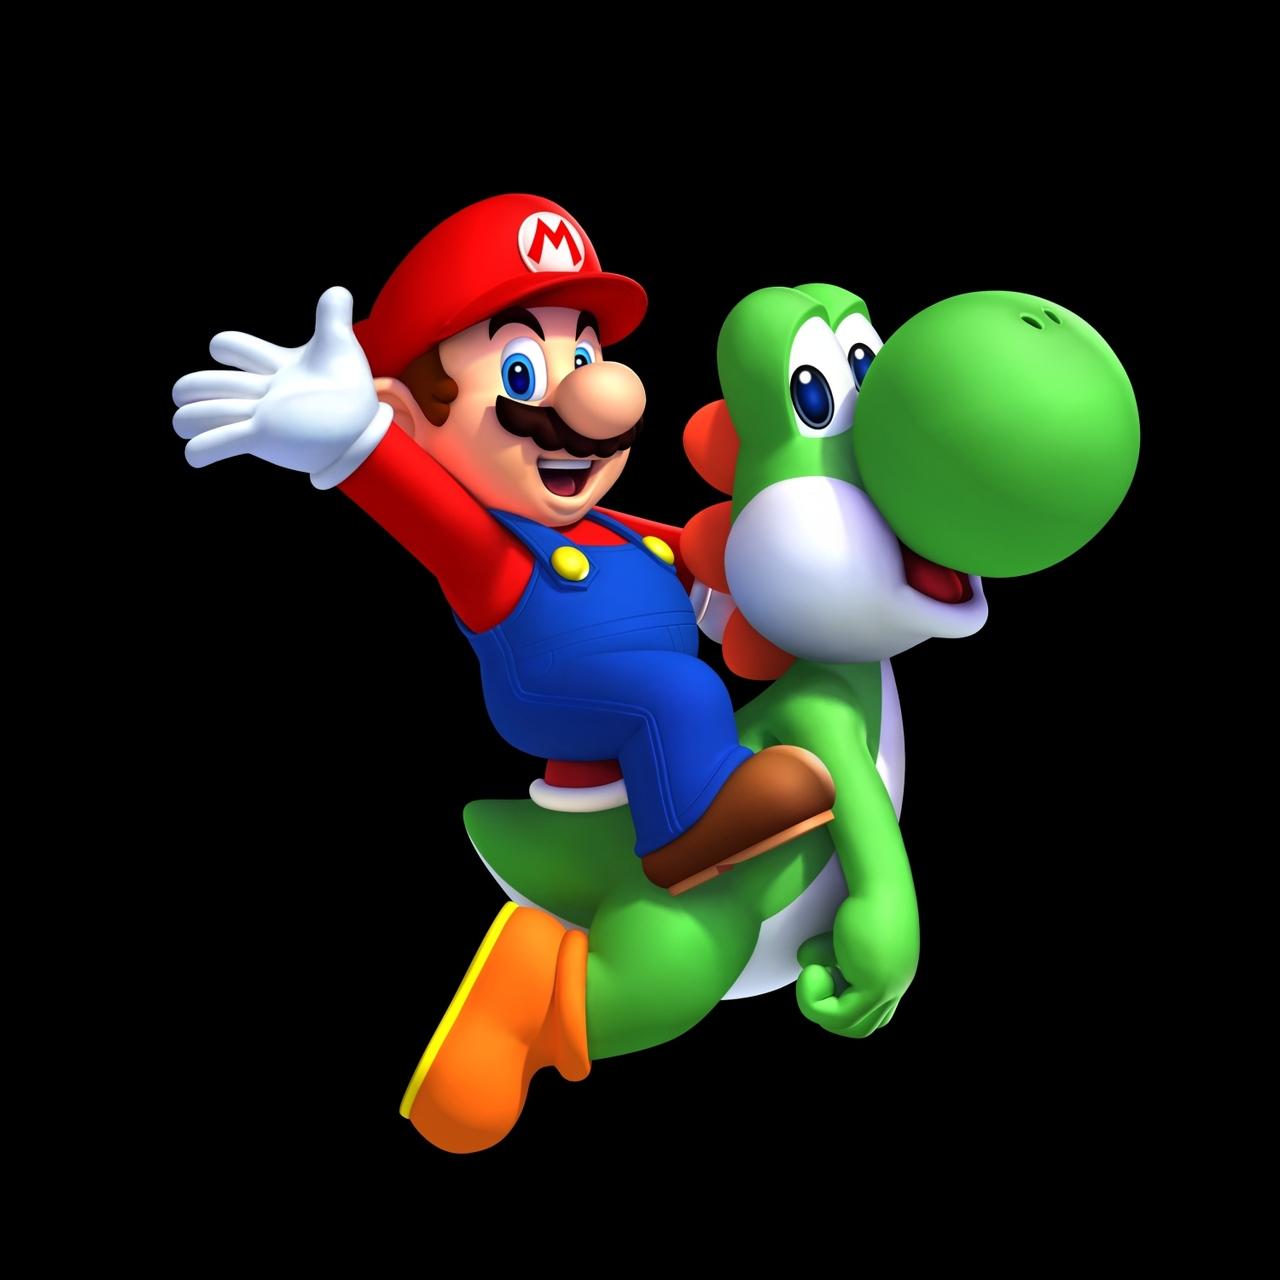 jeuxvideo.com New Super Mario Bros. U - Wii U Image 27 sur 266